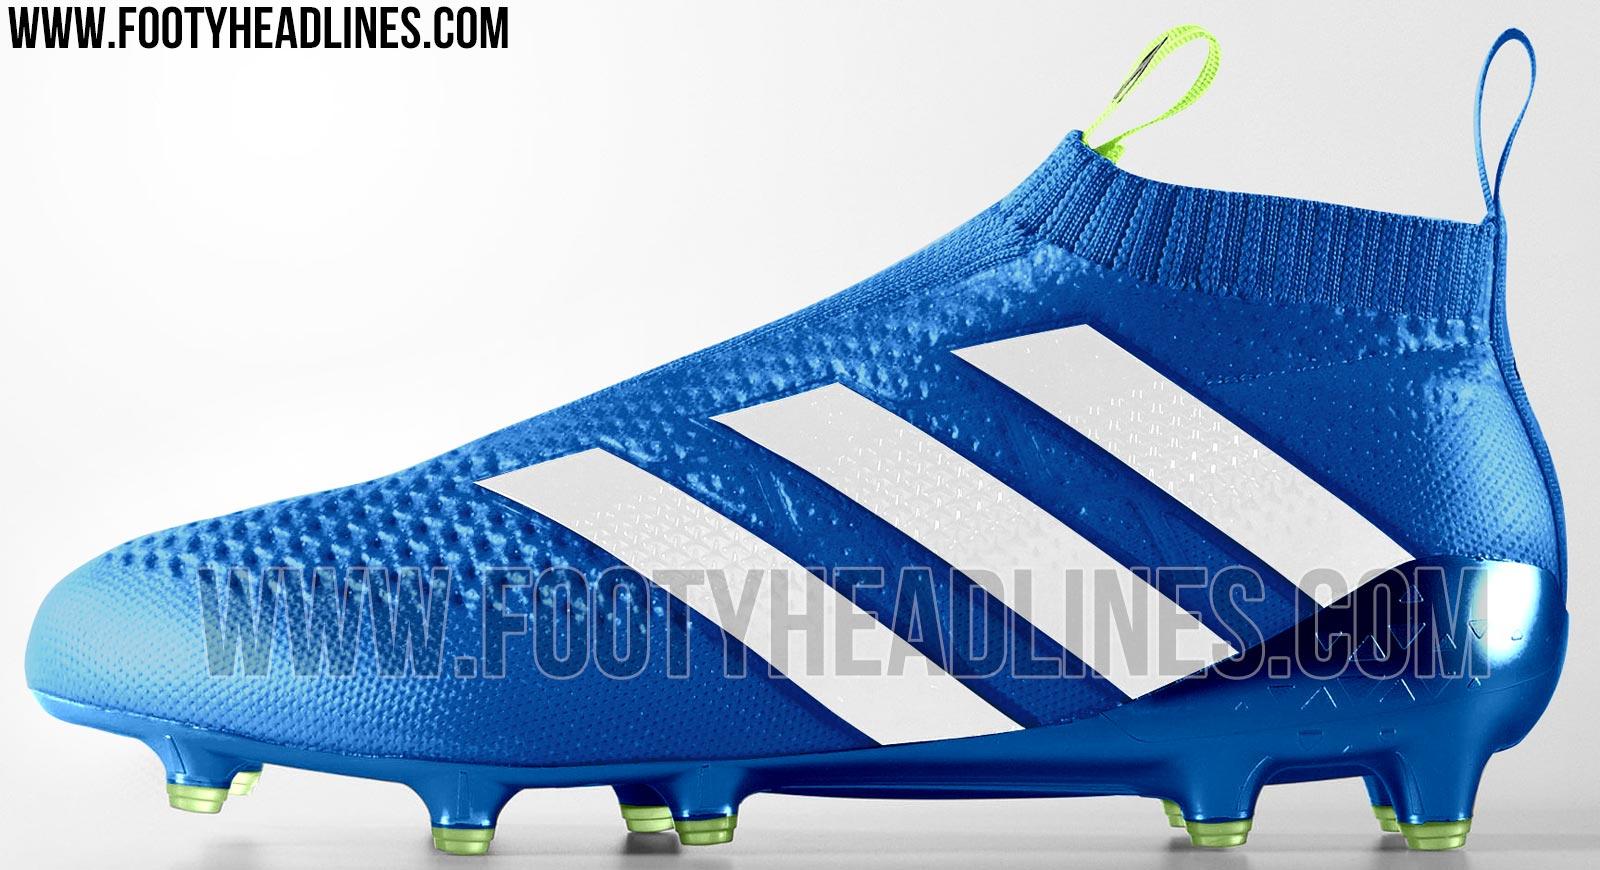 adidas ace 16 purecontrol sky blue green